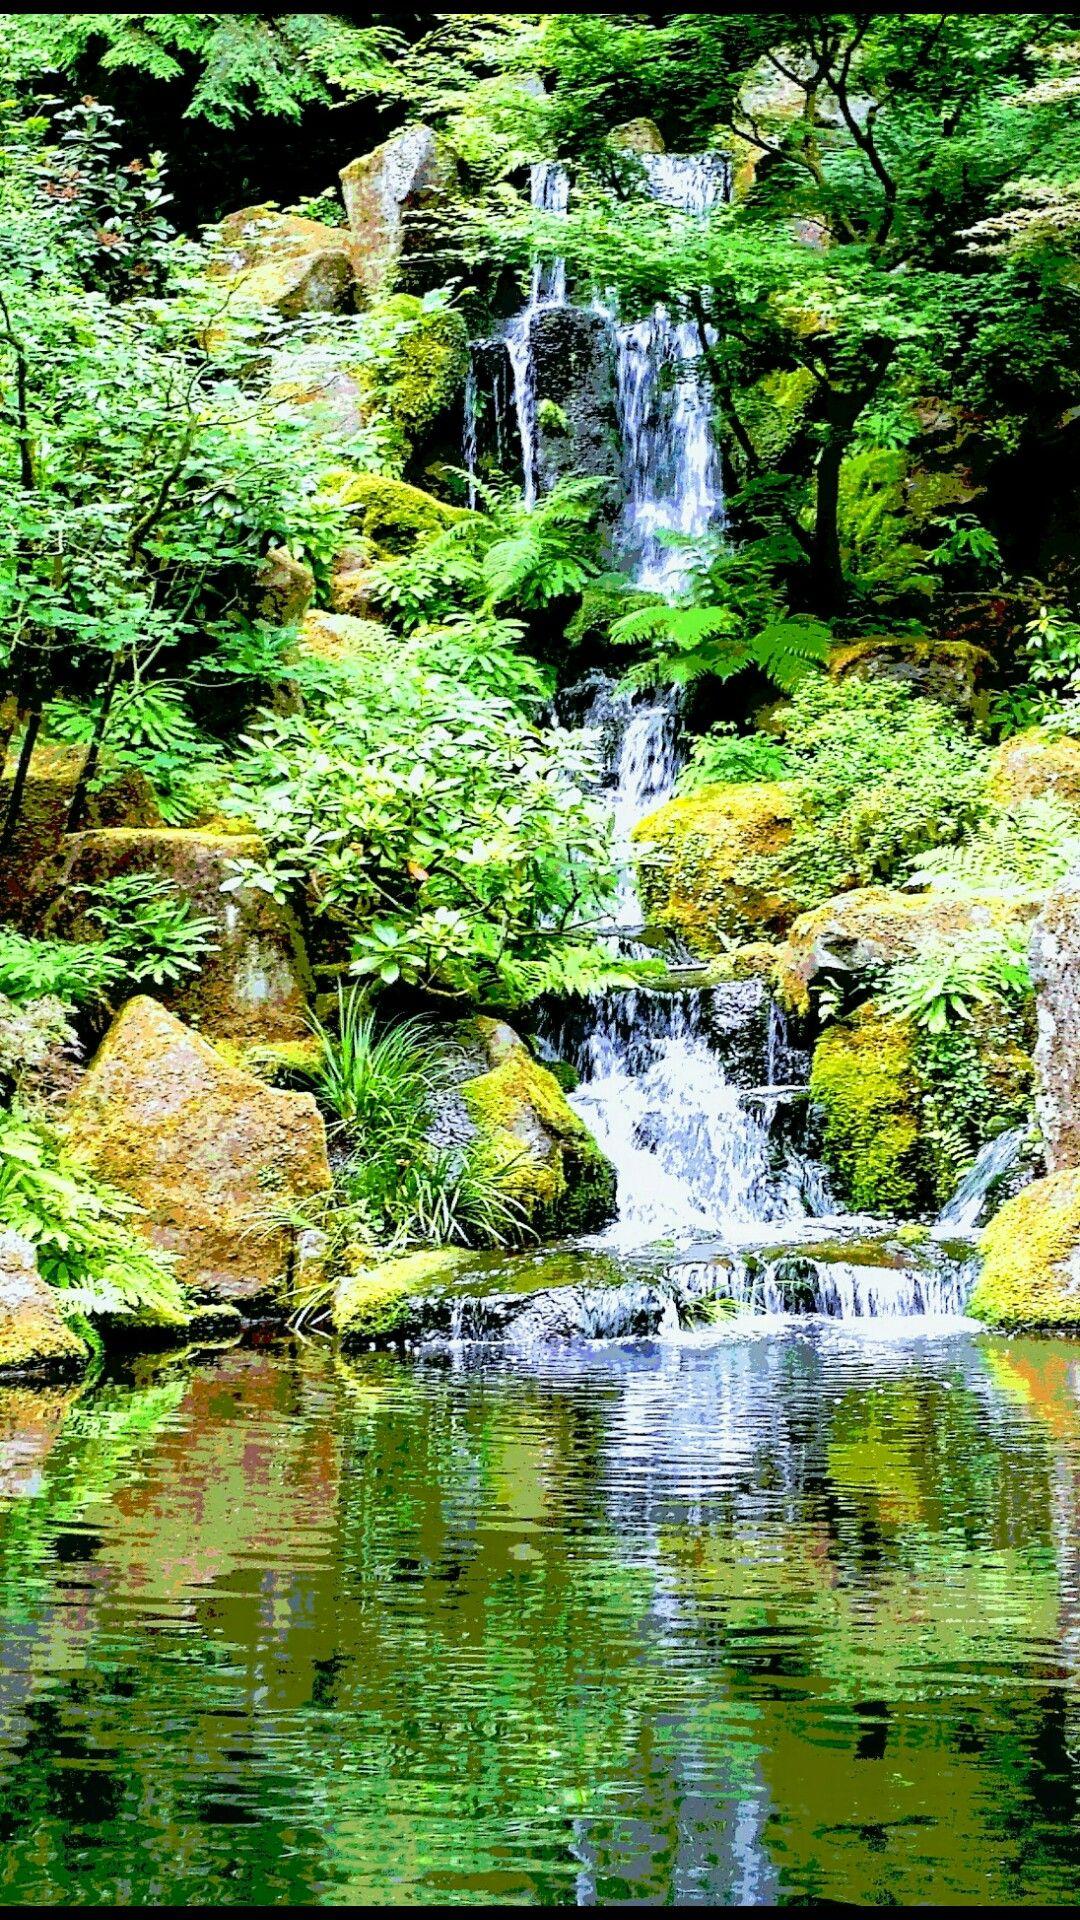 The beautiful Japanese Gardens in Portland Oregon